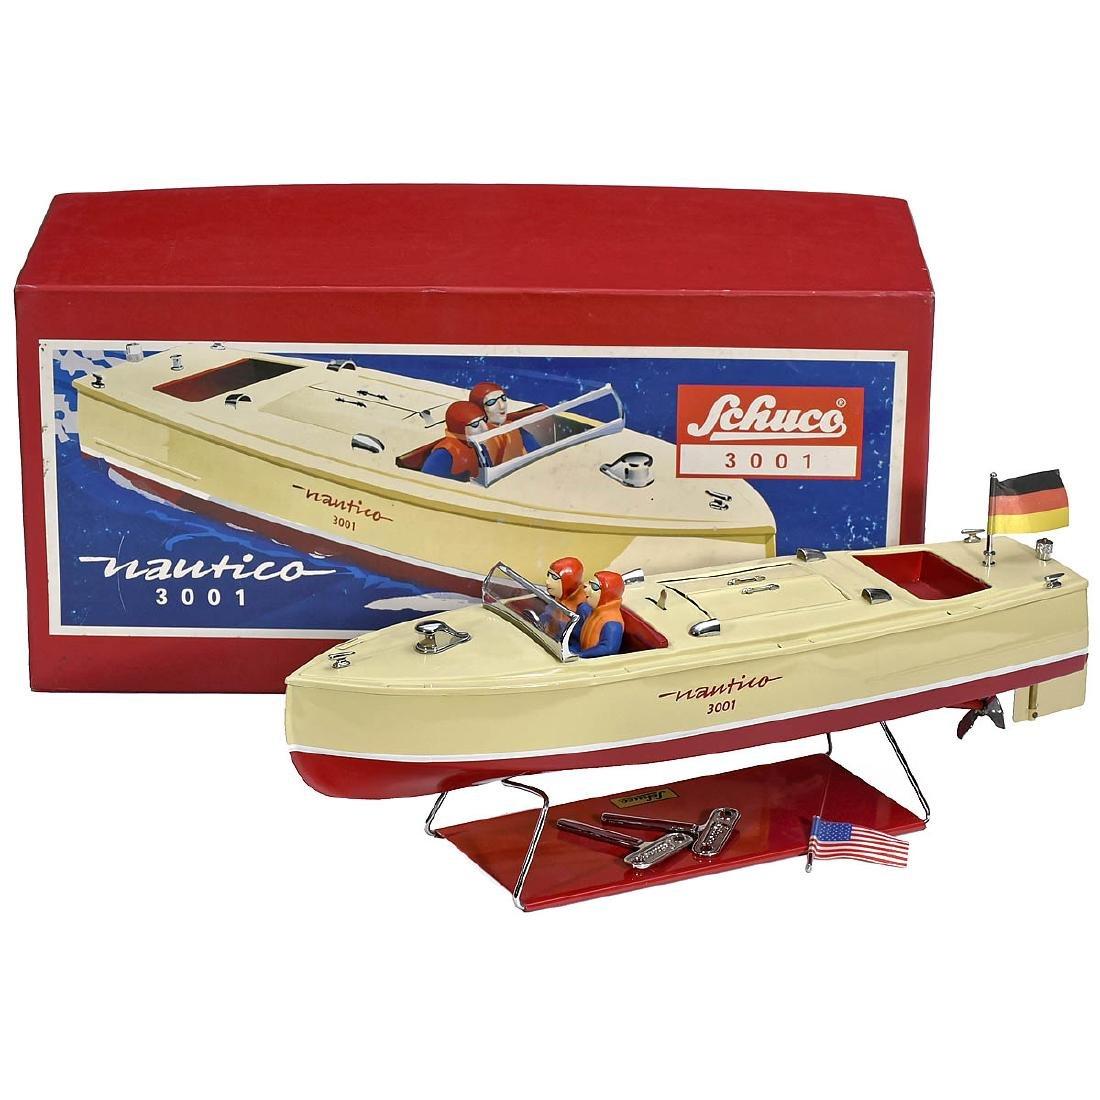 Schuco Nautico 3001 Motor Boat, c. 1990